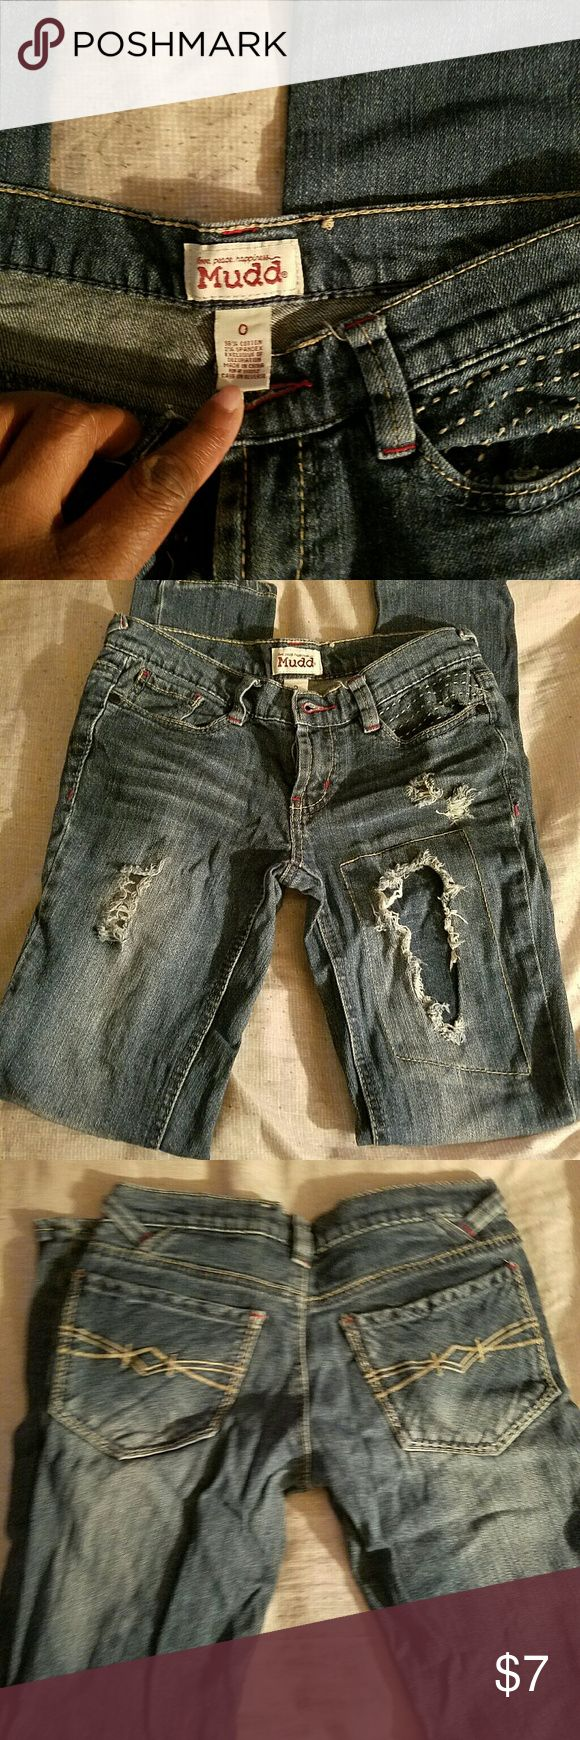 jeans Dark denim  ripped girls jeans Mudd Jeans Skinny